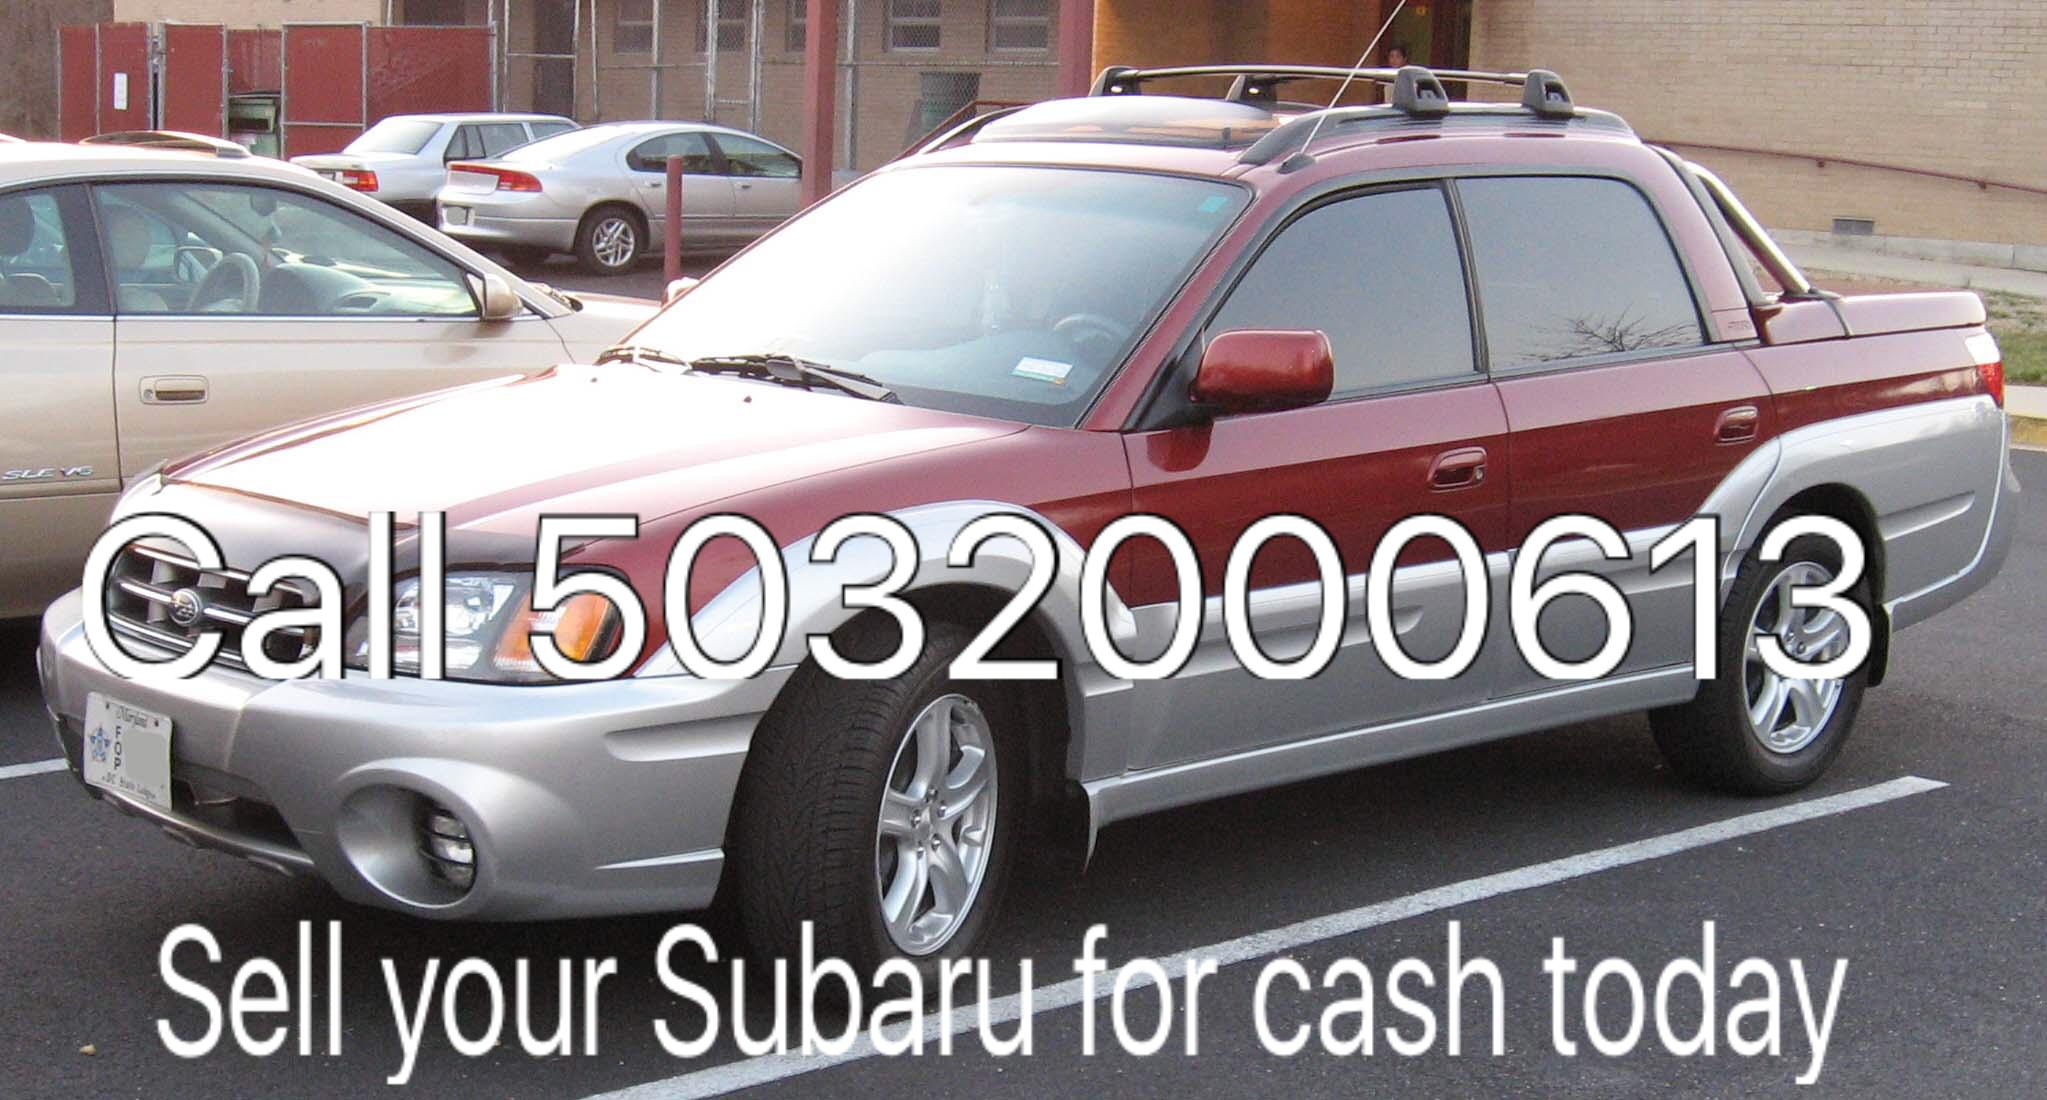 fast cash 4 junk cars buy junk car in Portland OR, buy junk cars in ...